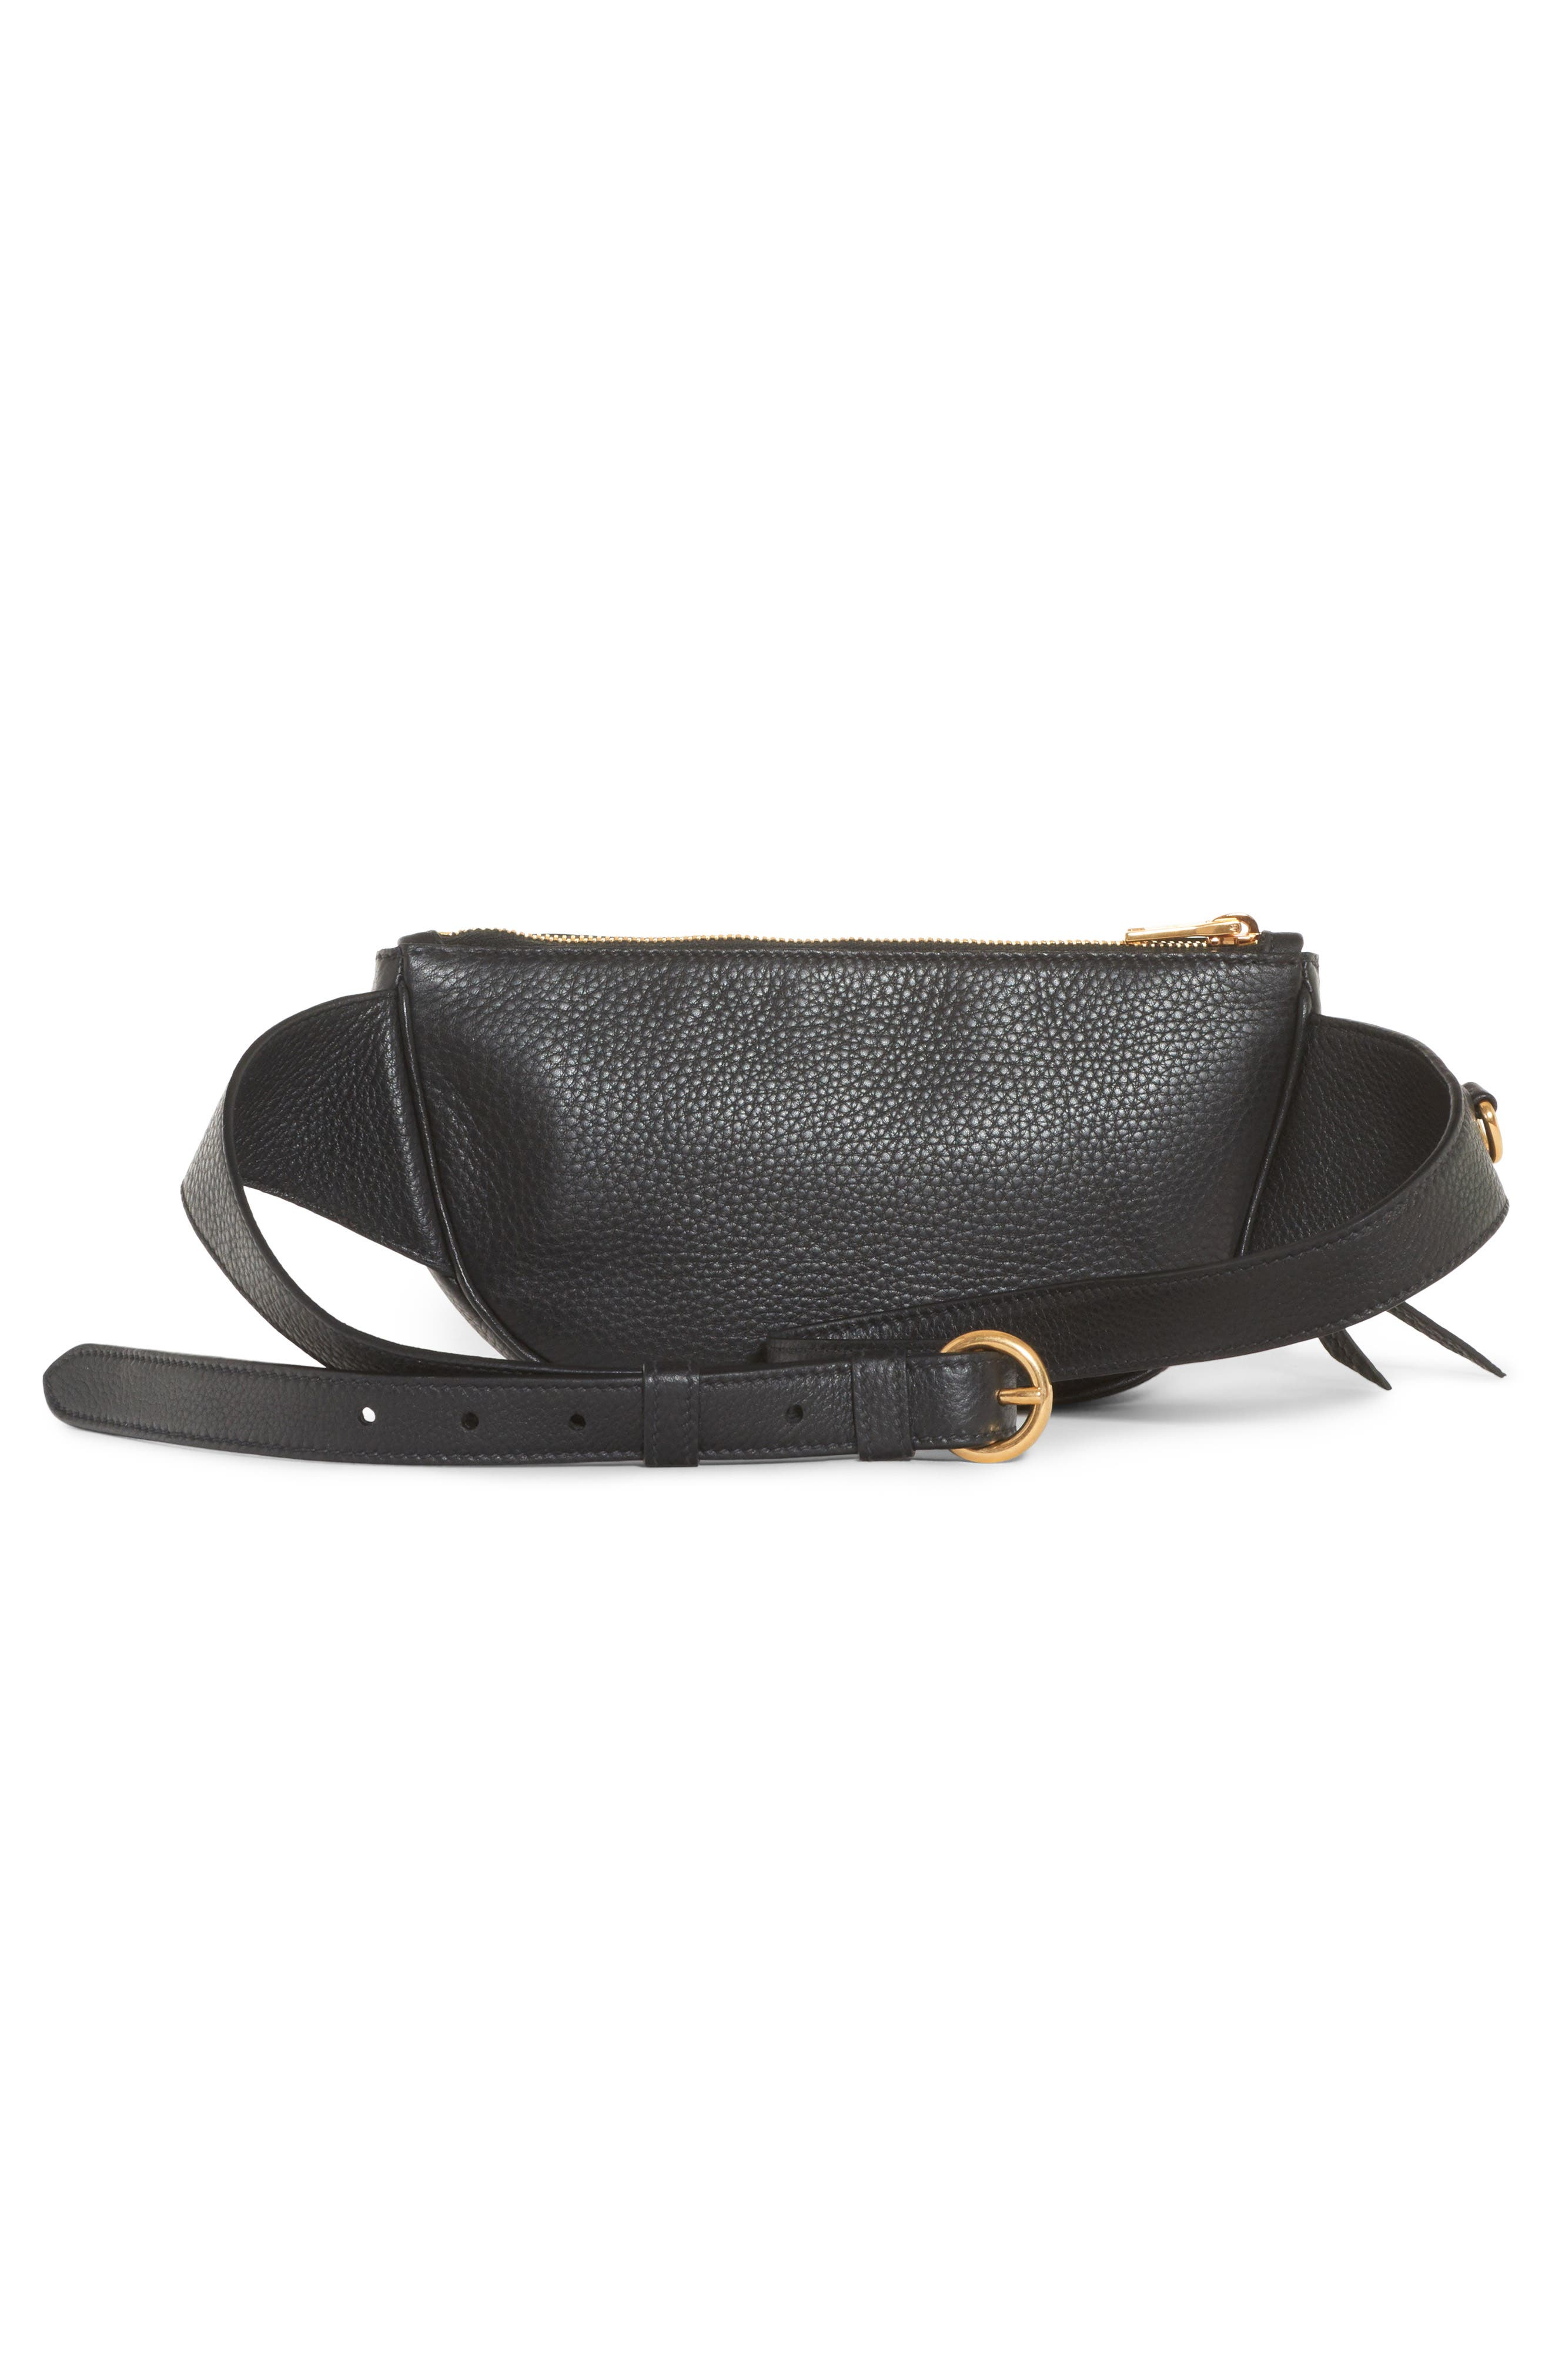 Daino Leather Belt Bag,                             Alternate thumbnail 2, color,                             001